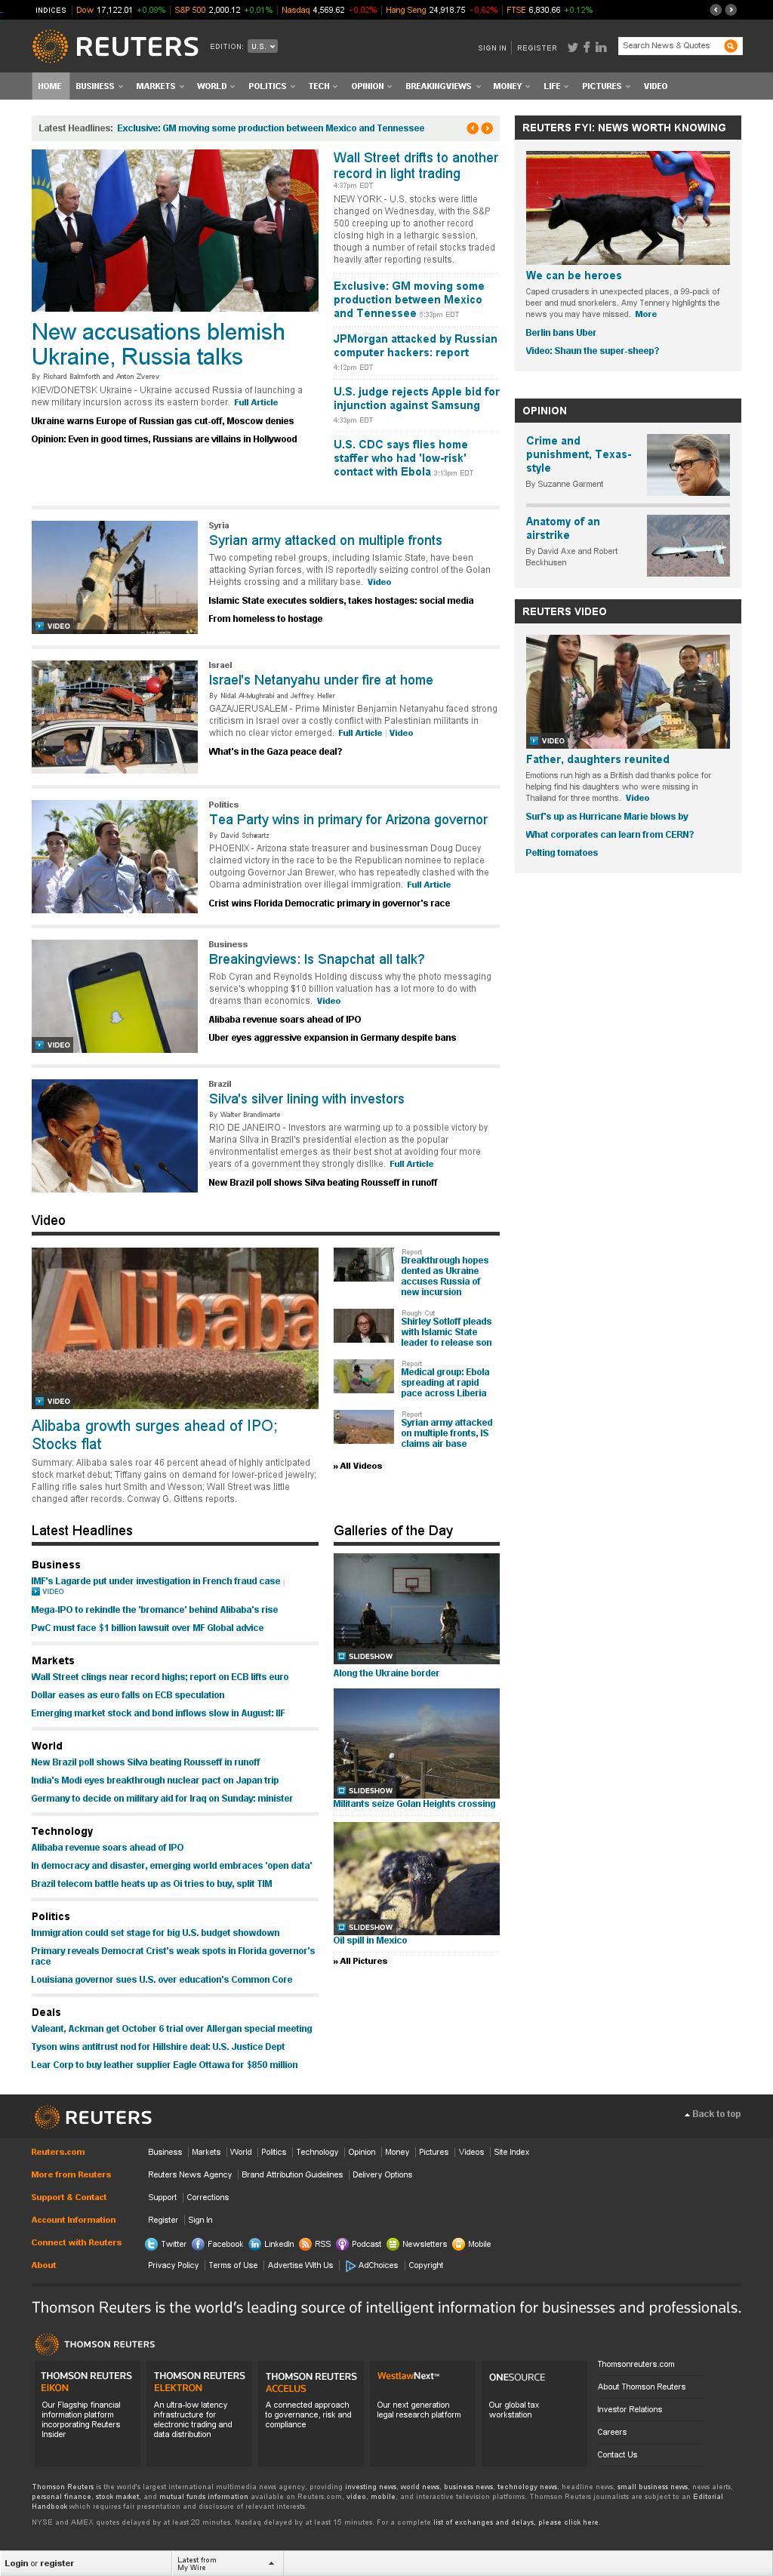 Reuters at Wednesday Aug. 27, 2014, 10:15 p.m. UTC